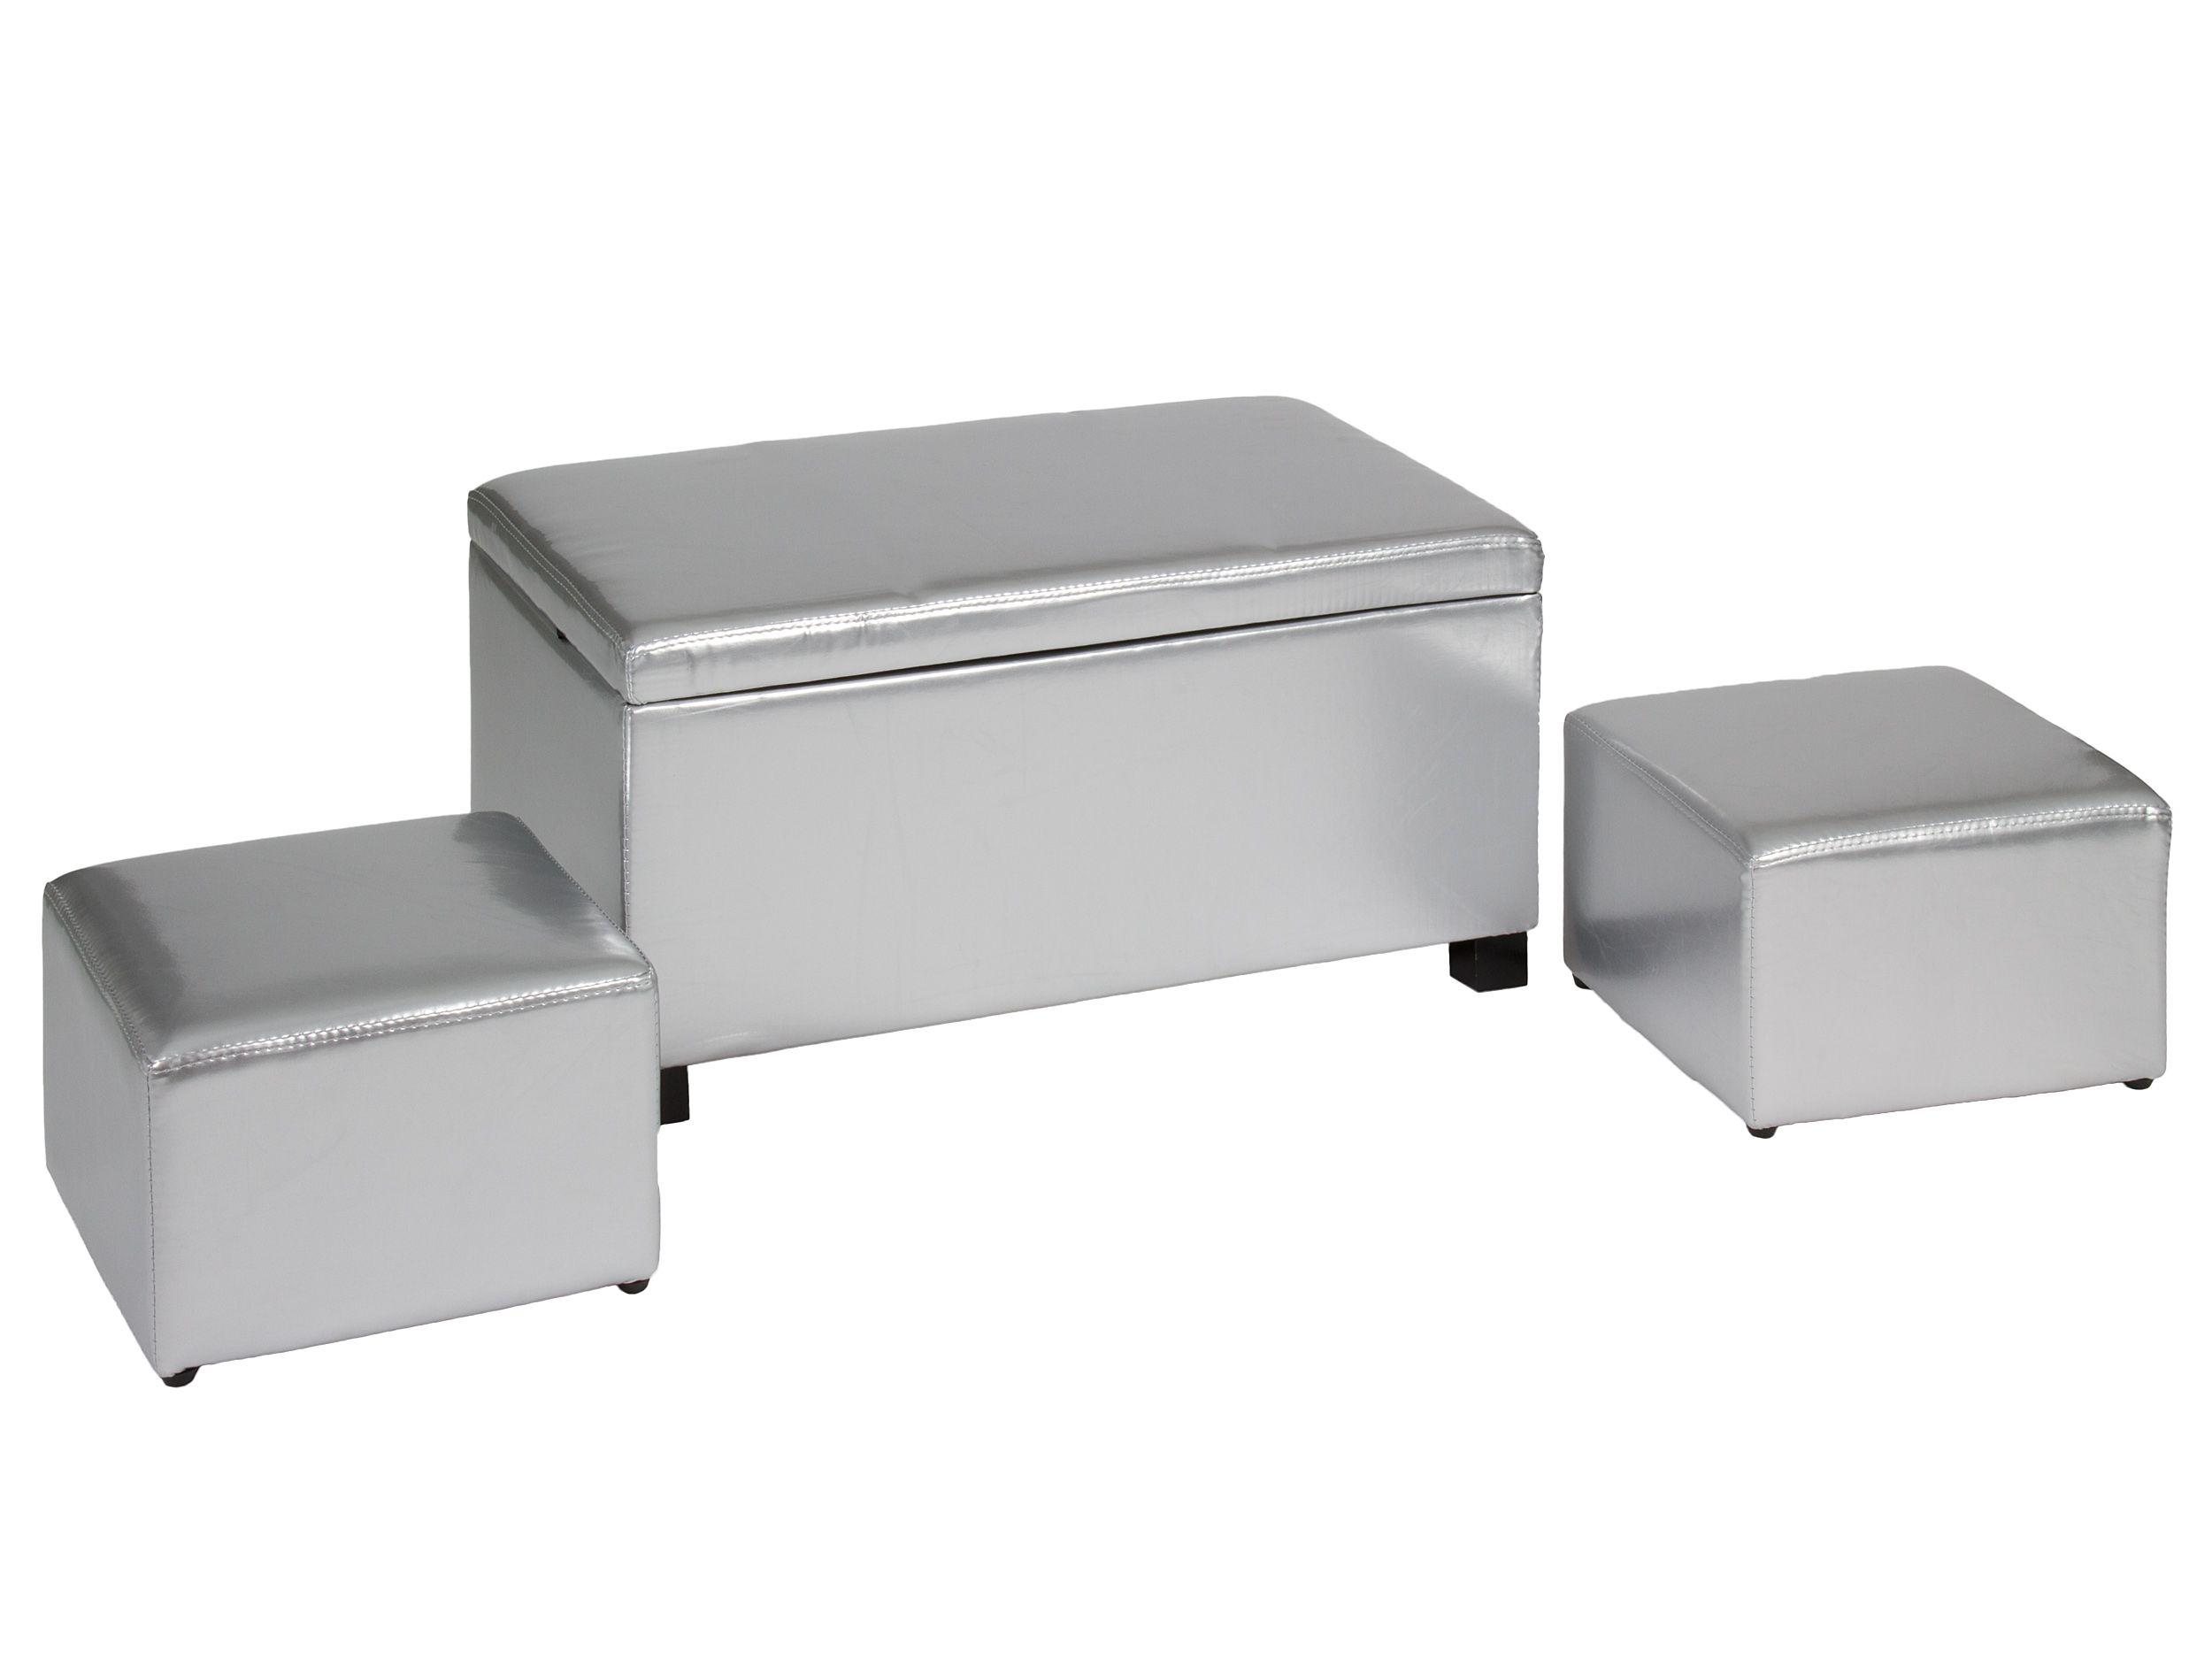 Panca Imbottita Dalani : Set di 1 panchetta contenitore e 2 pouf in similpelle argento